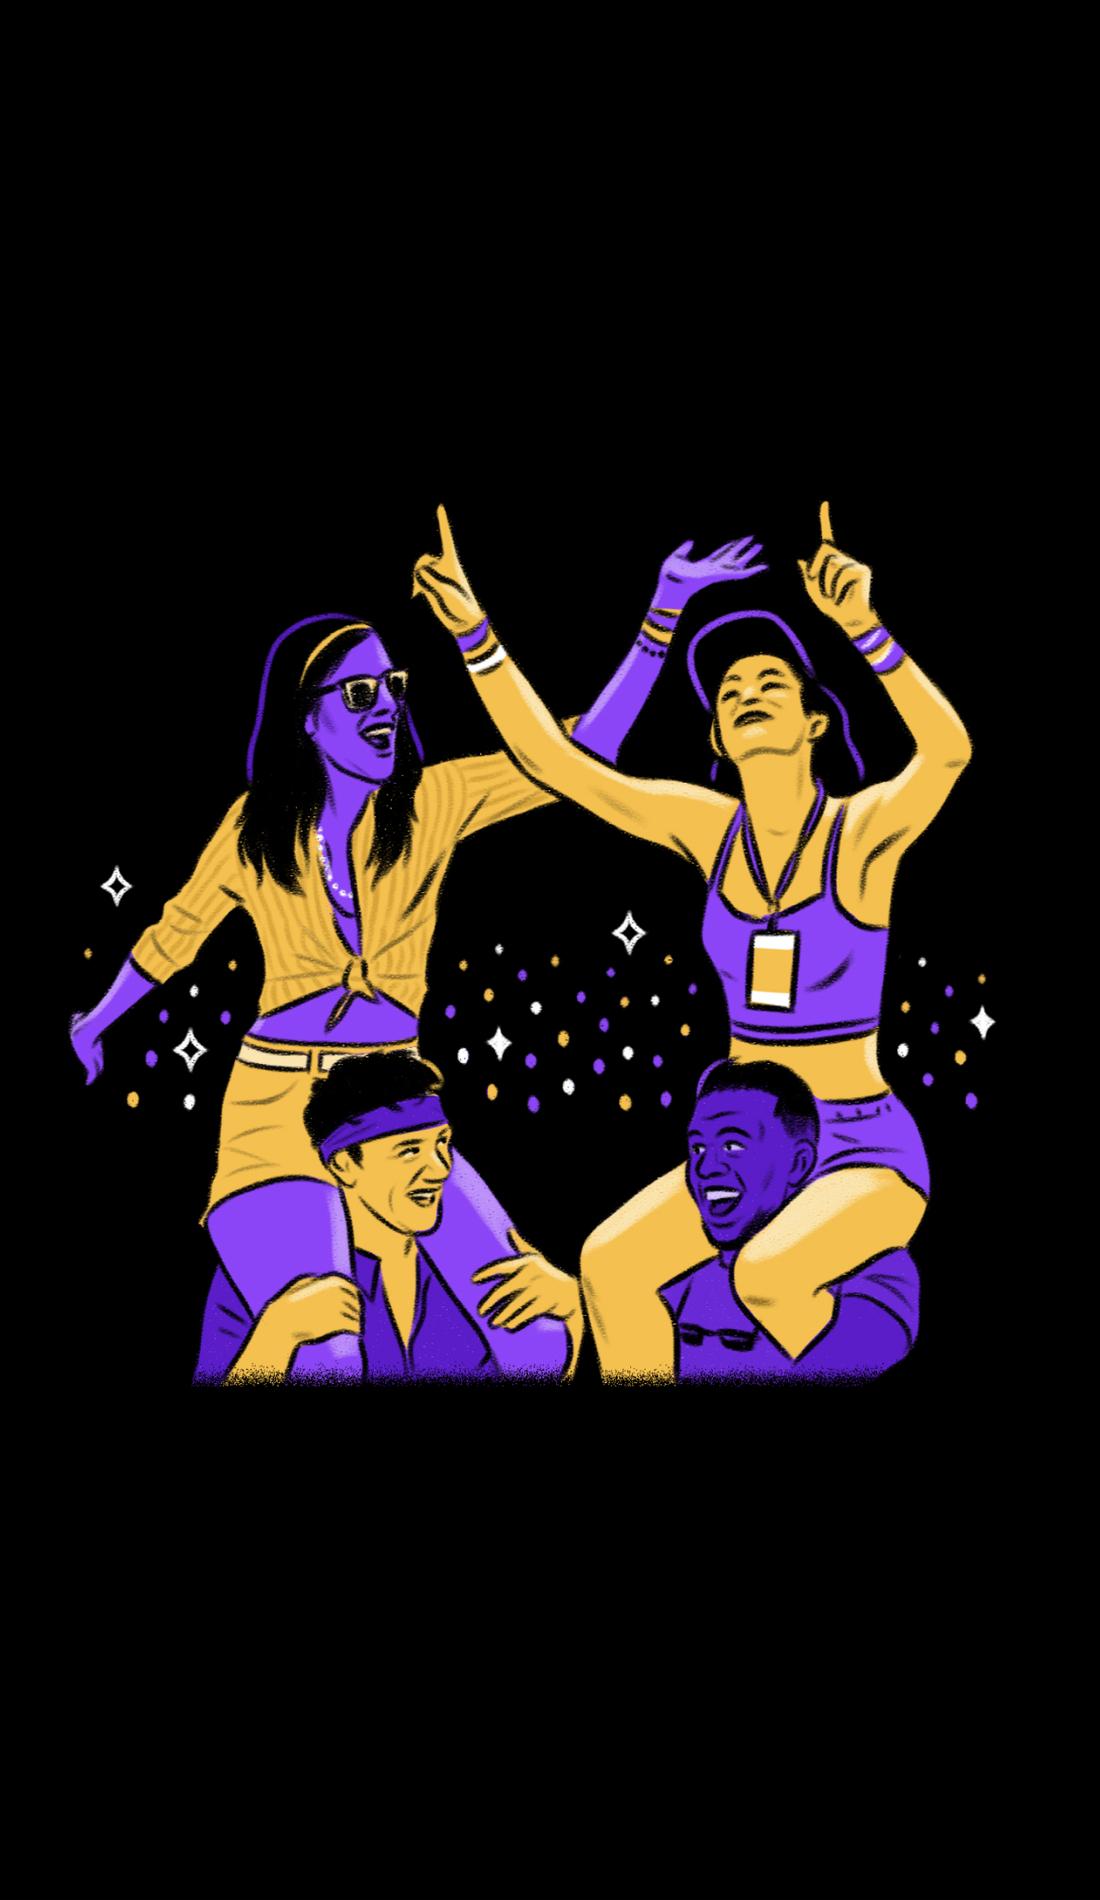 A Telluride Bluegrass Festival live event